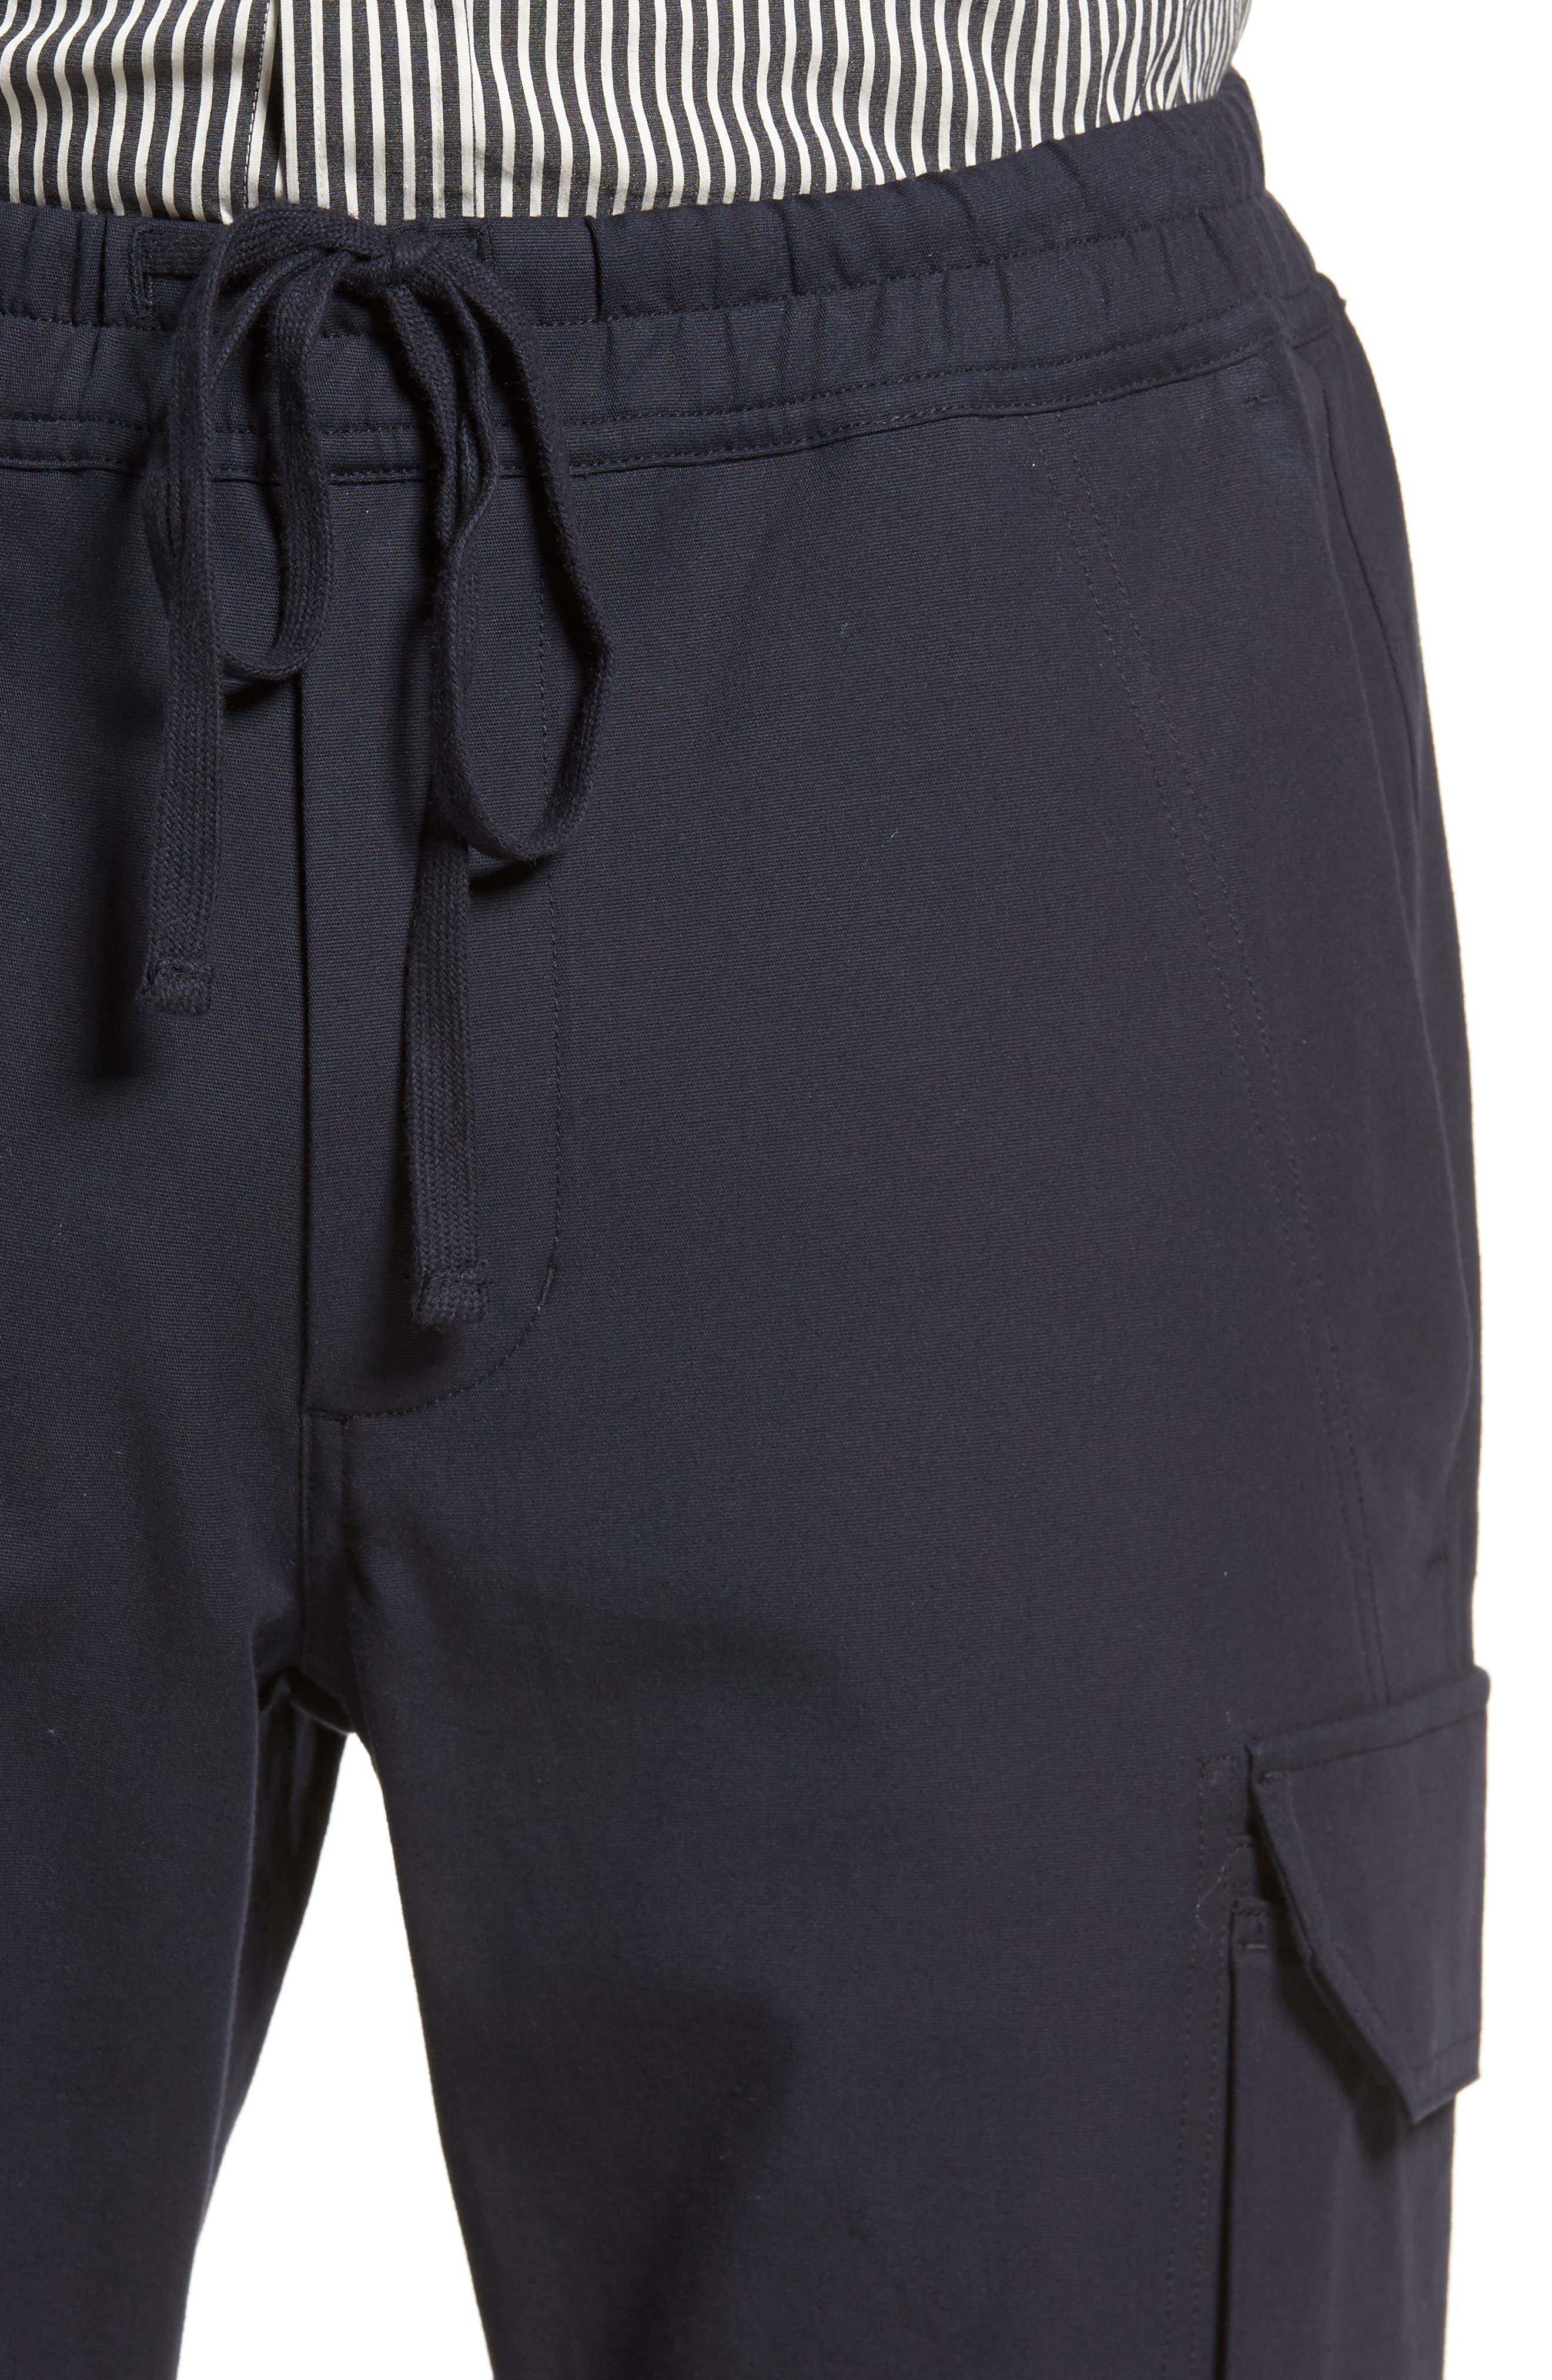 Regular Fit Drawstring Pants,                             Alternate thumbnail 4, color,                             New Coastal